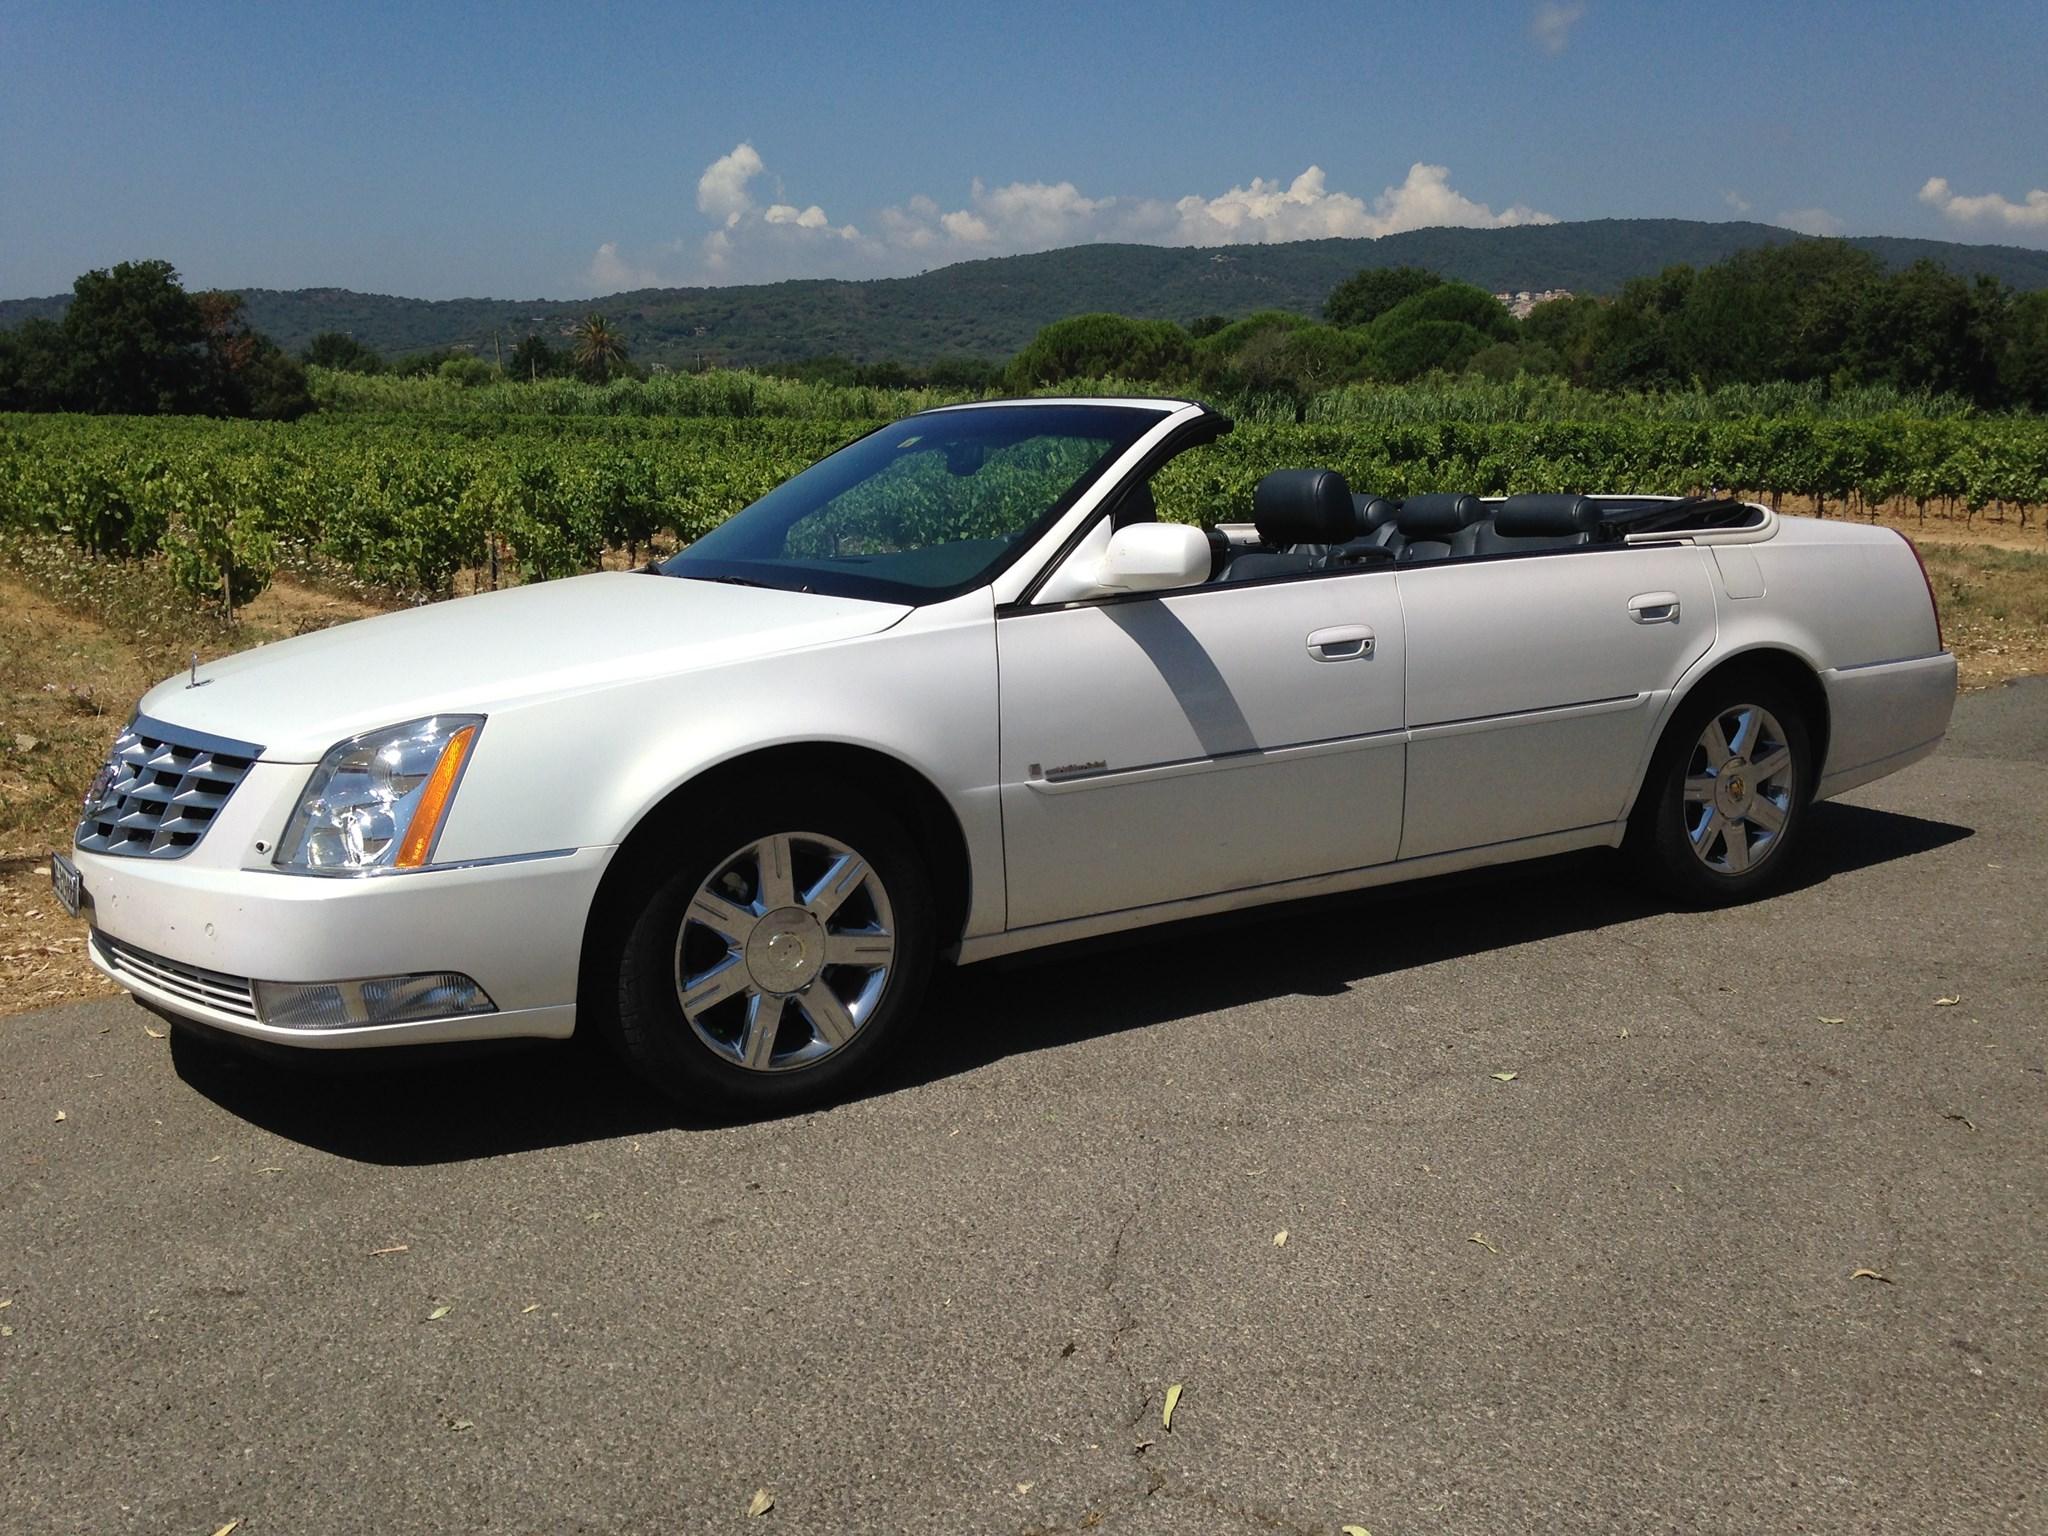 cabriolet Cadillac DTS 4-türiges Cabriolet (sehr selten!)